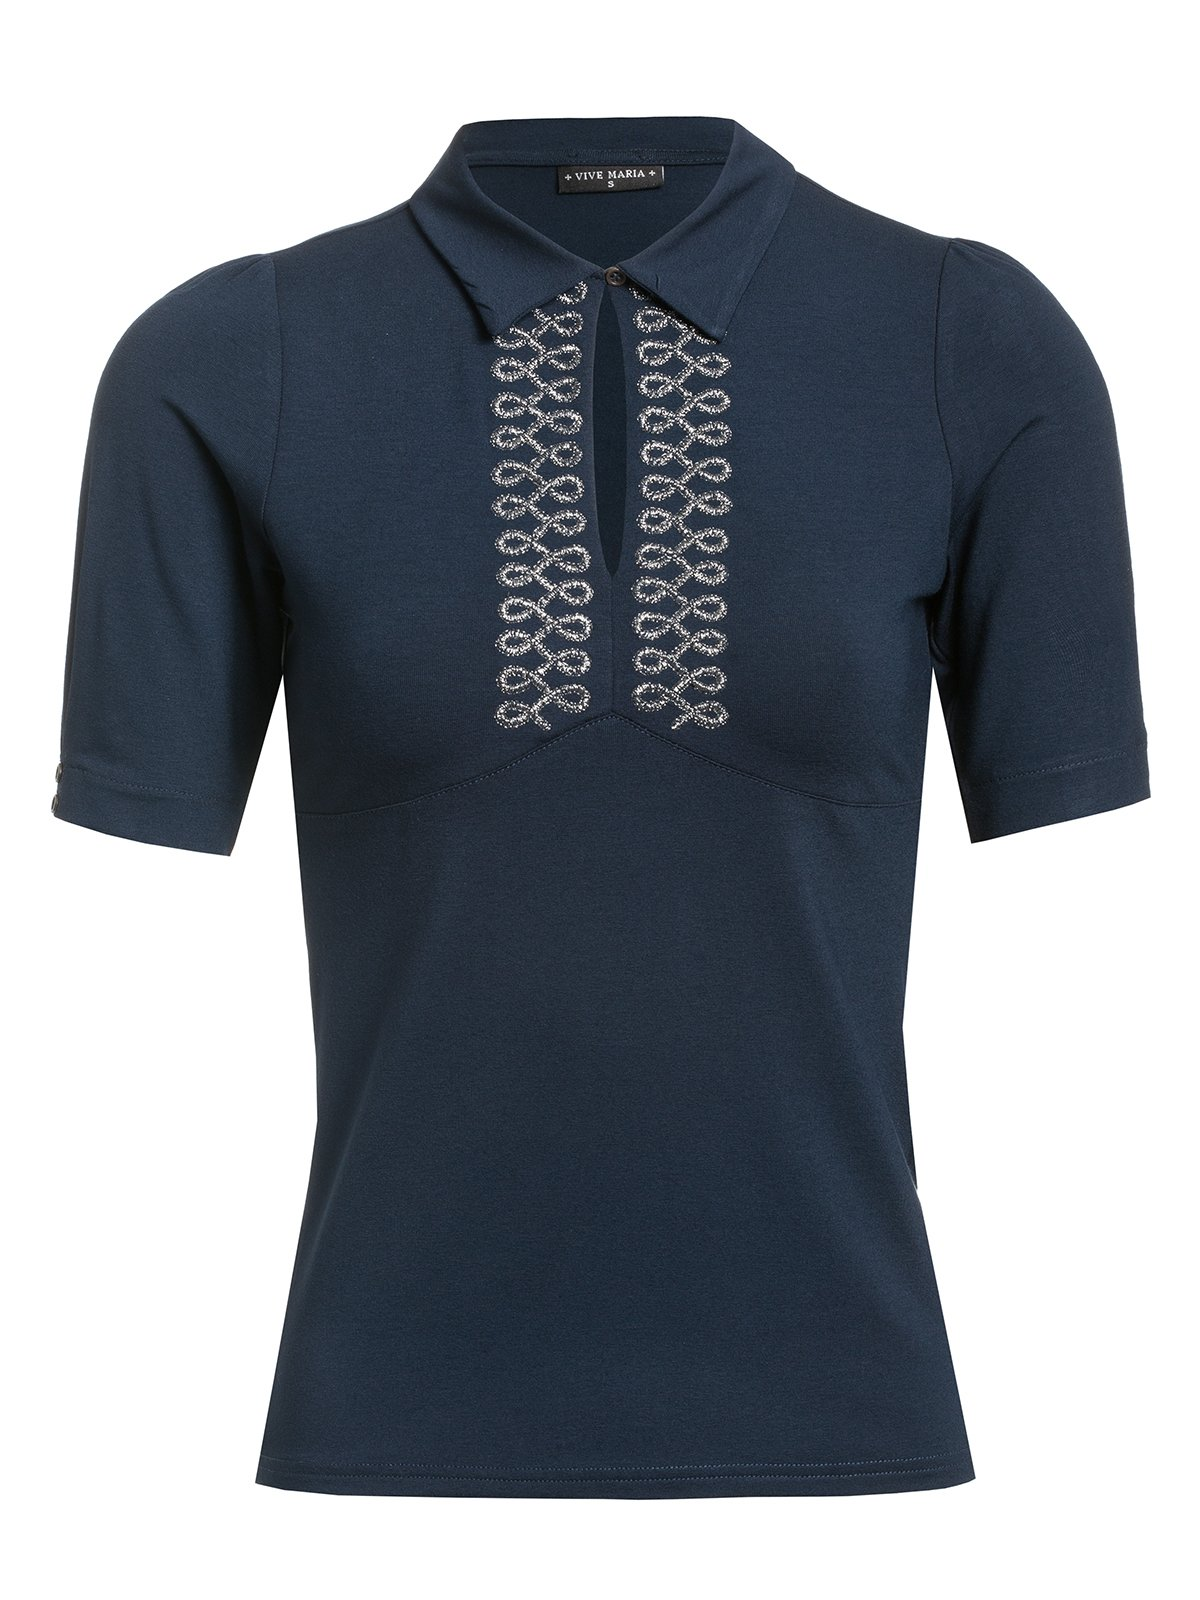 Vive-Maria-Miss-Sergeant-Shirt-blue-38205